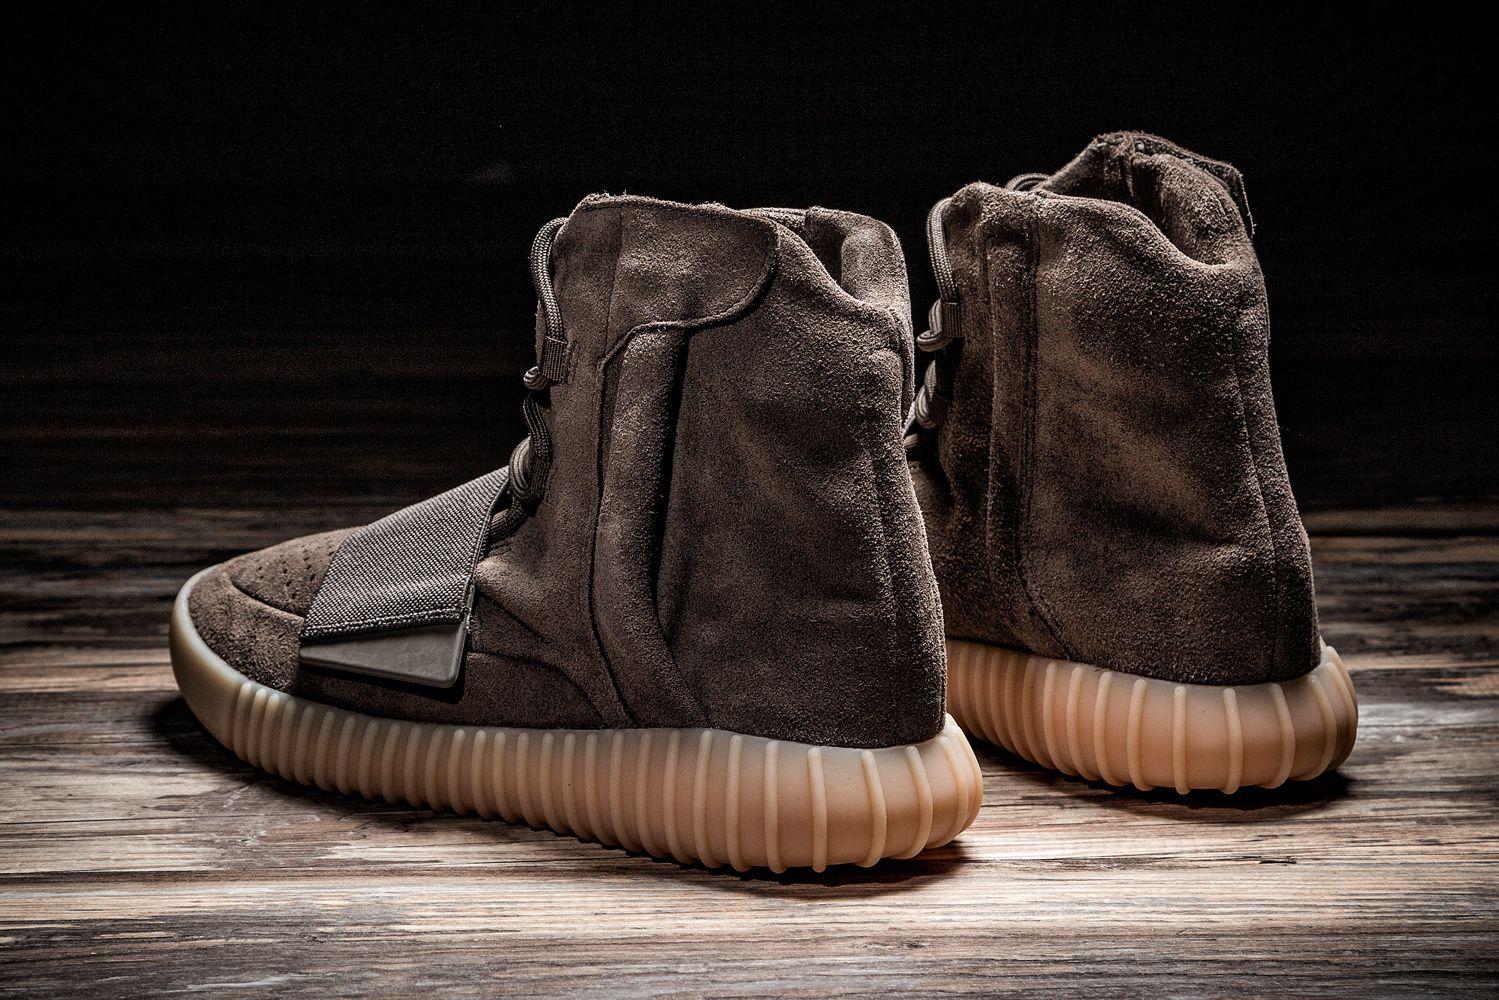 c375bd72eb0 入手指南-adidas Originals YEEZY BOOST 750「Chocolate」登陸 HBX 商城 ...